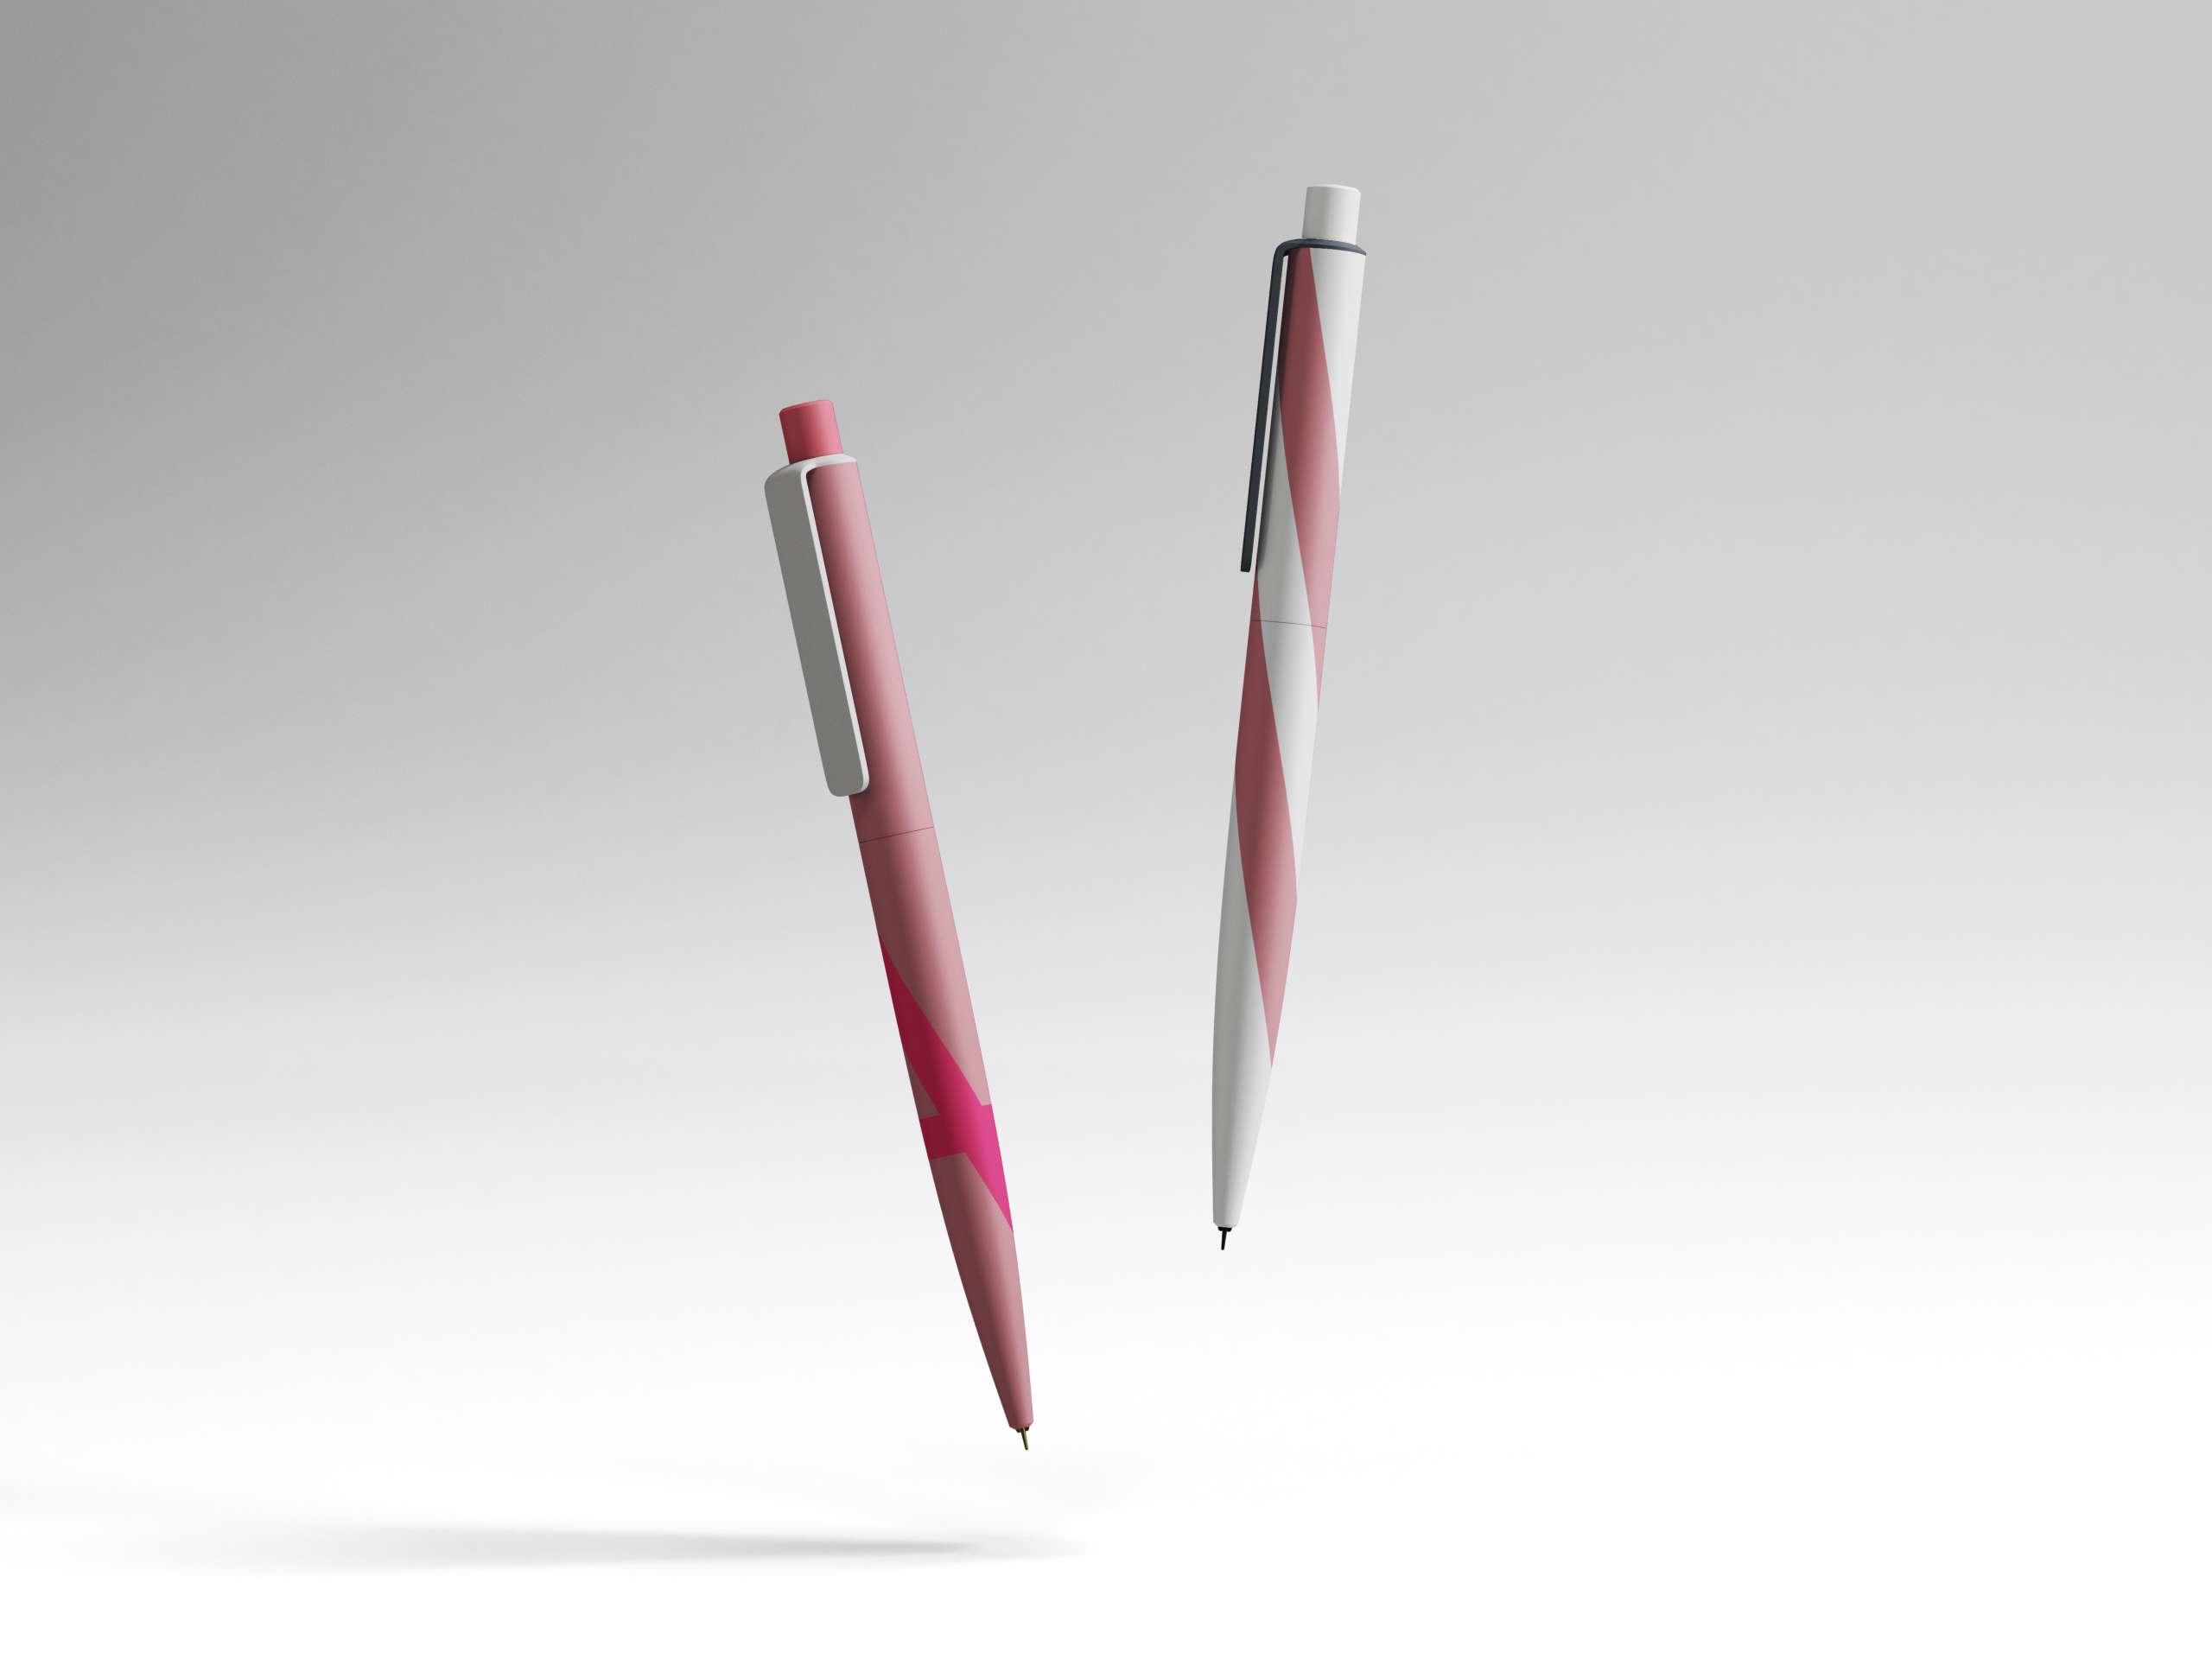 2 Pens